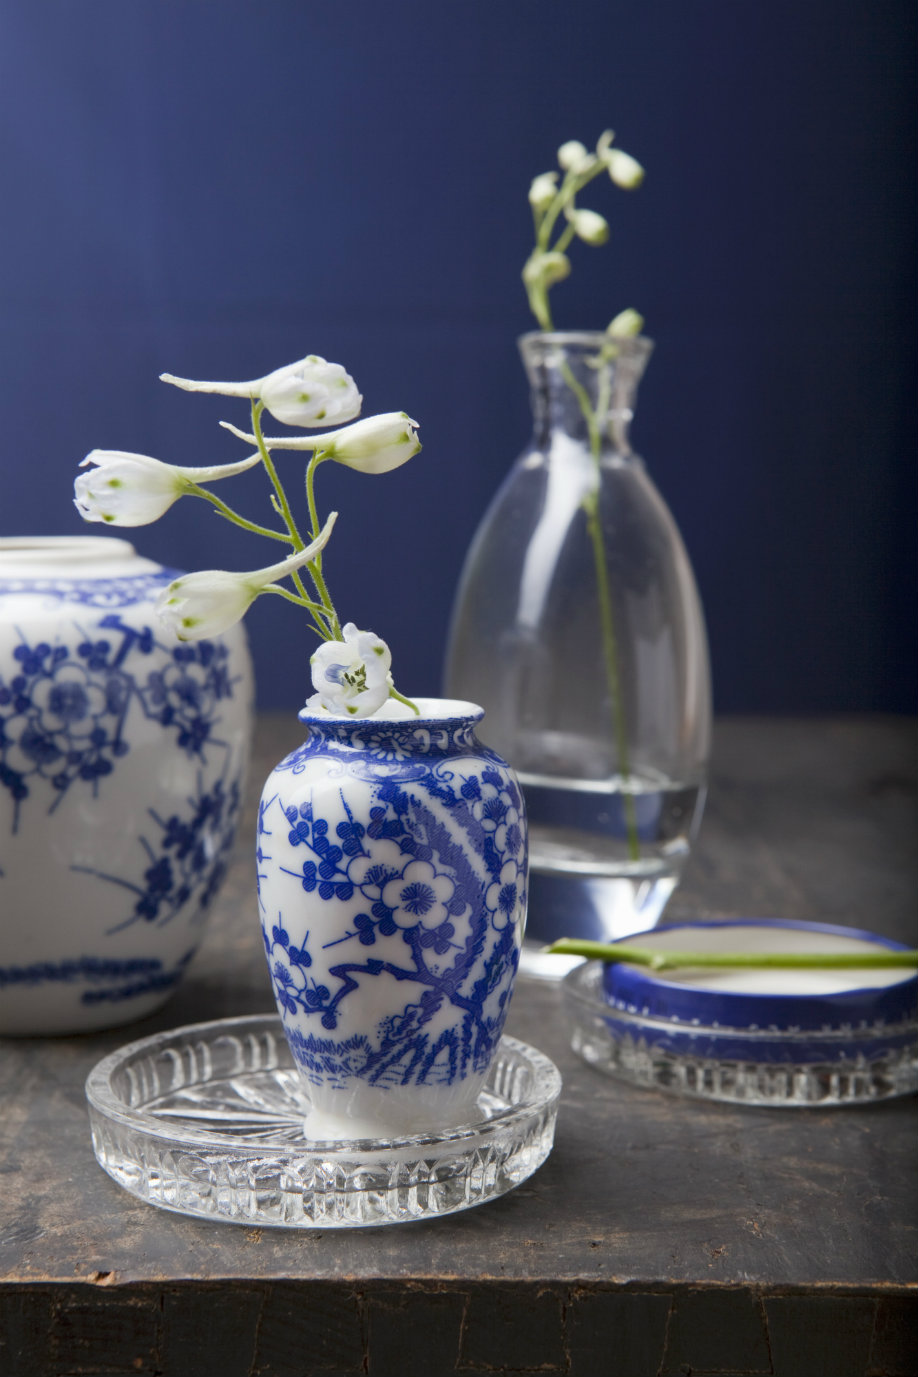 westwing-chinoiserie-vase-blau-weißwestwing-chinoiserie-vase-blau-weiß